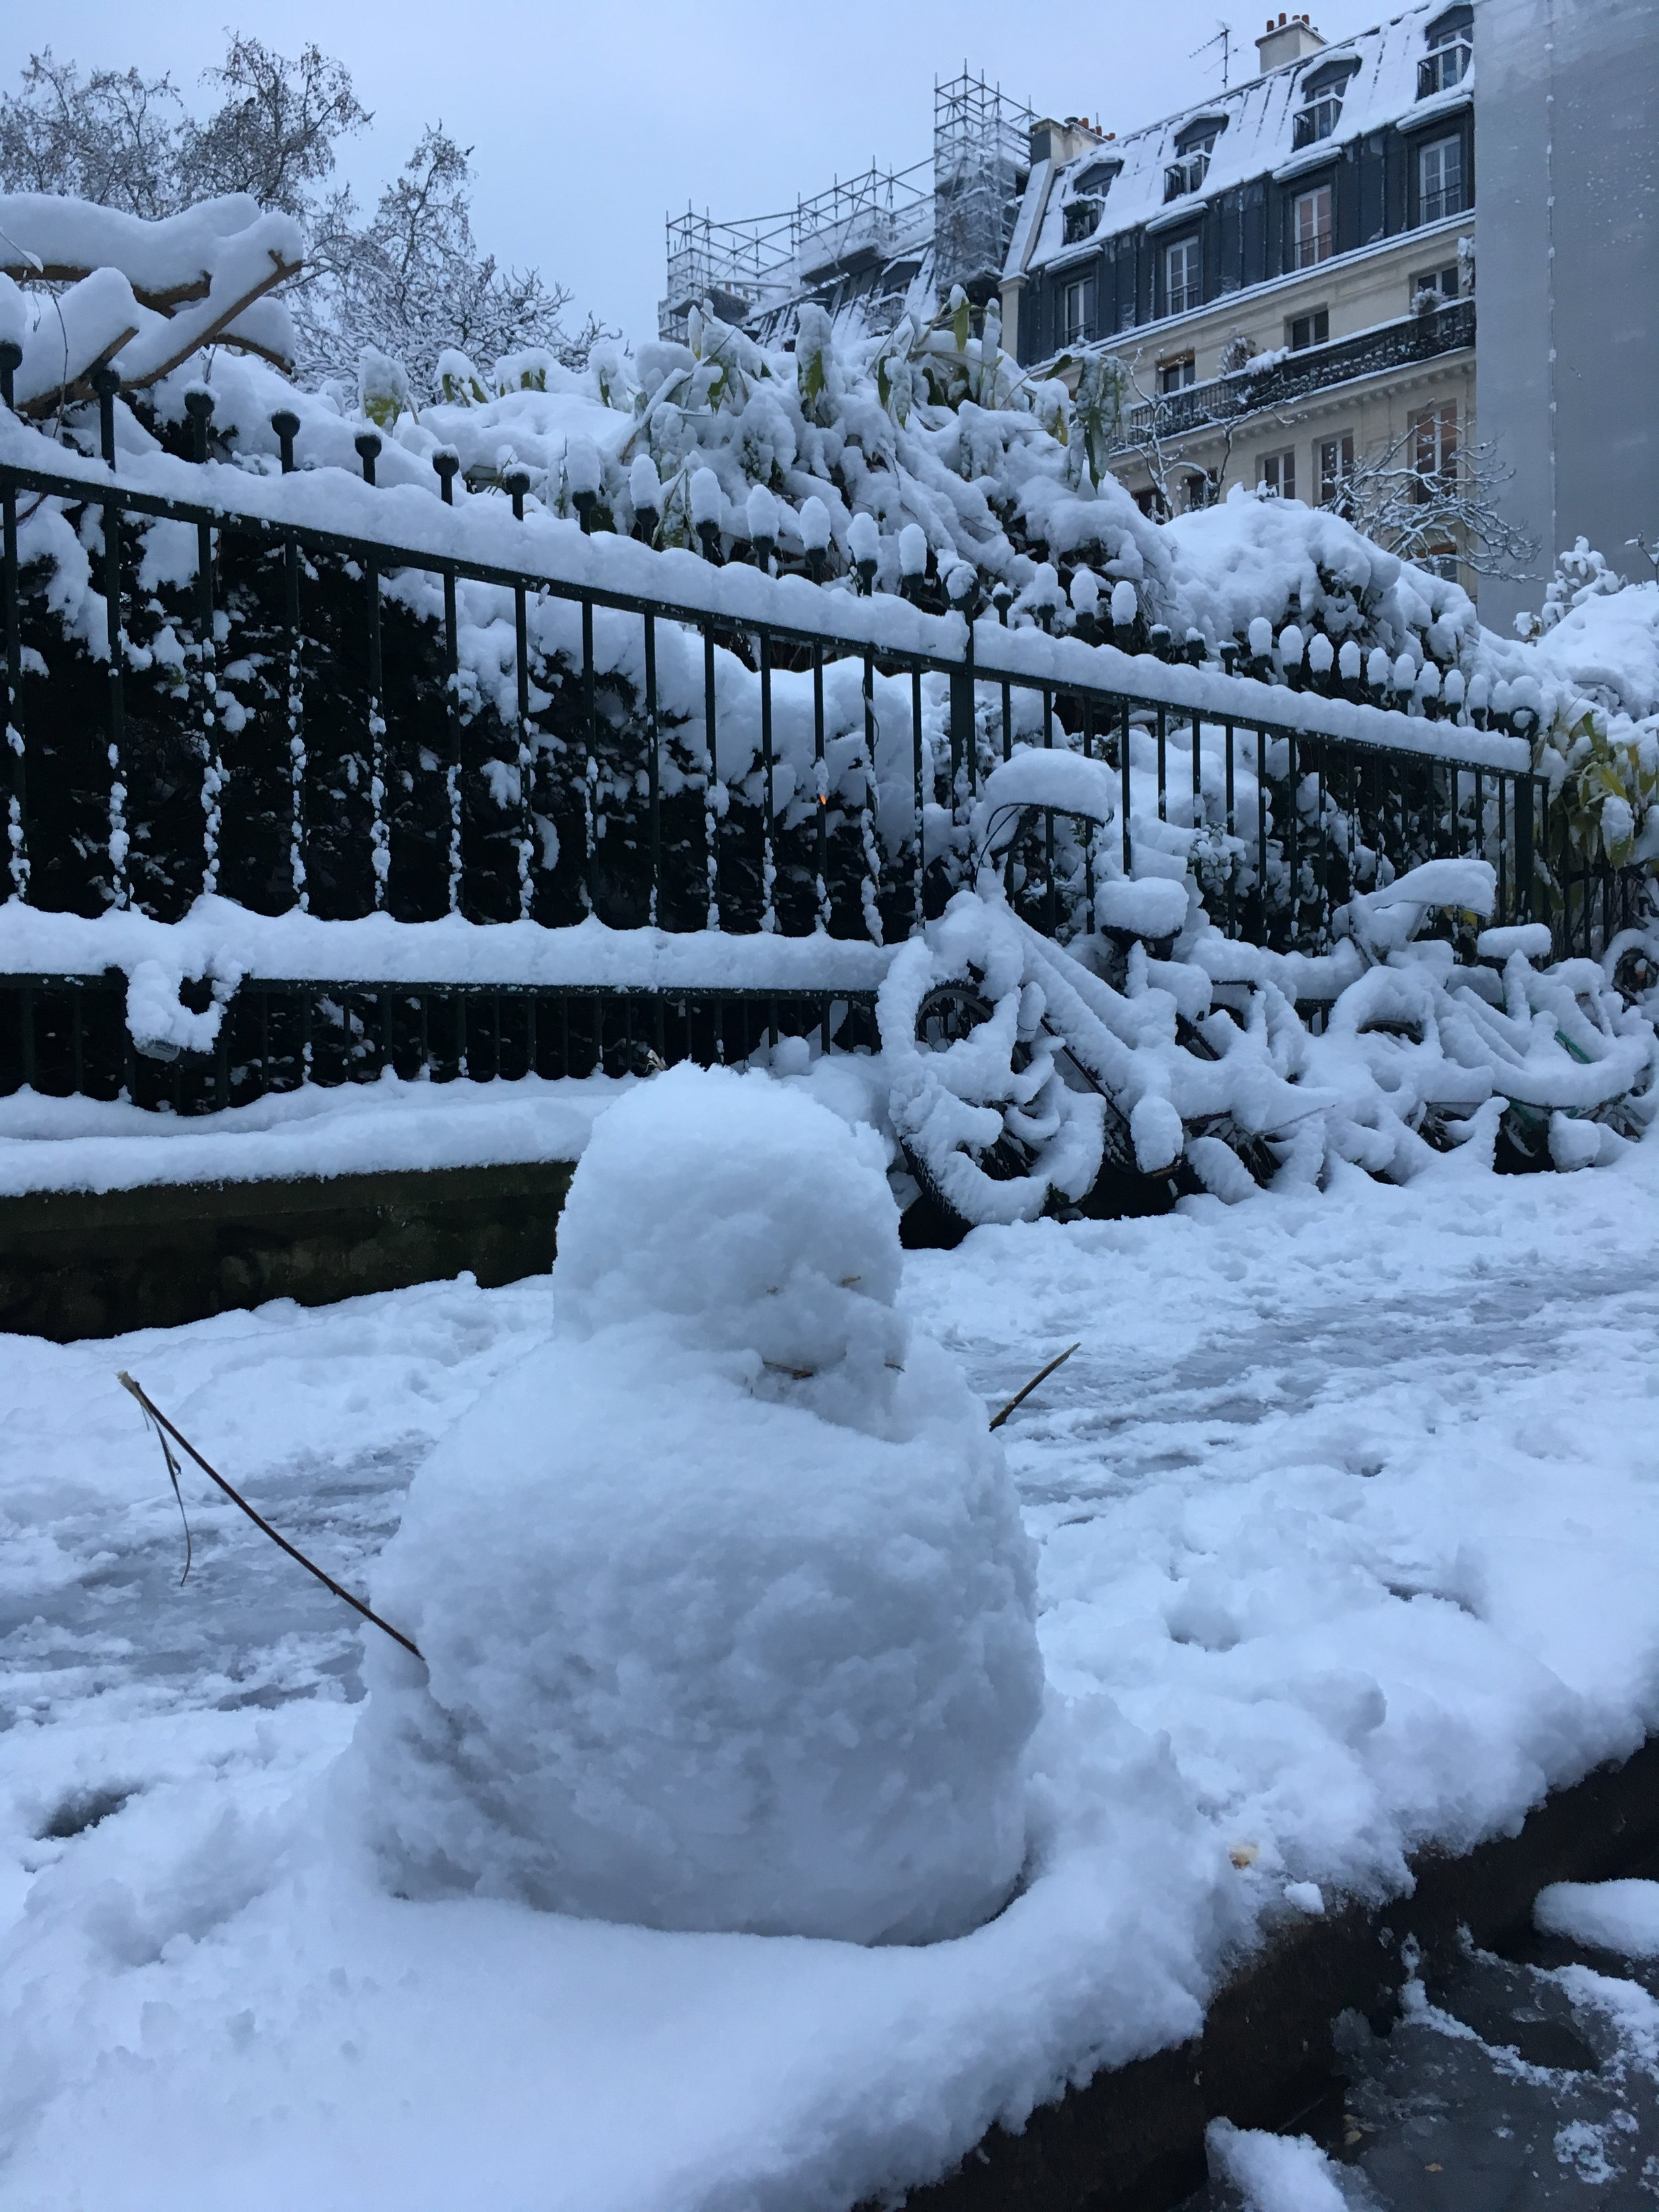 Snowman in Paris